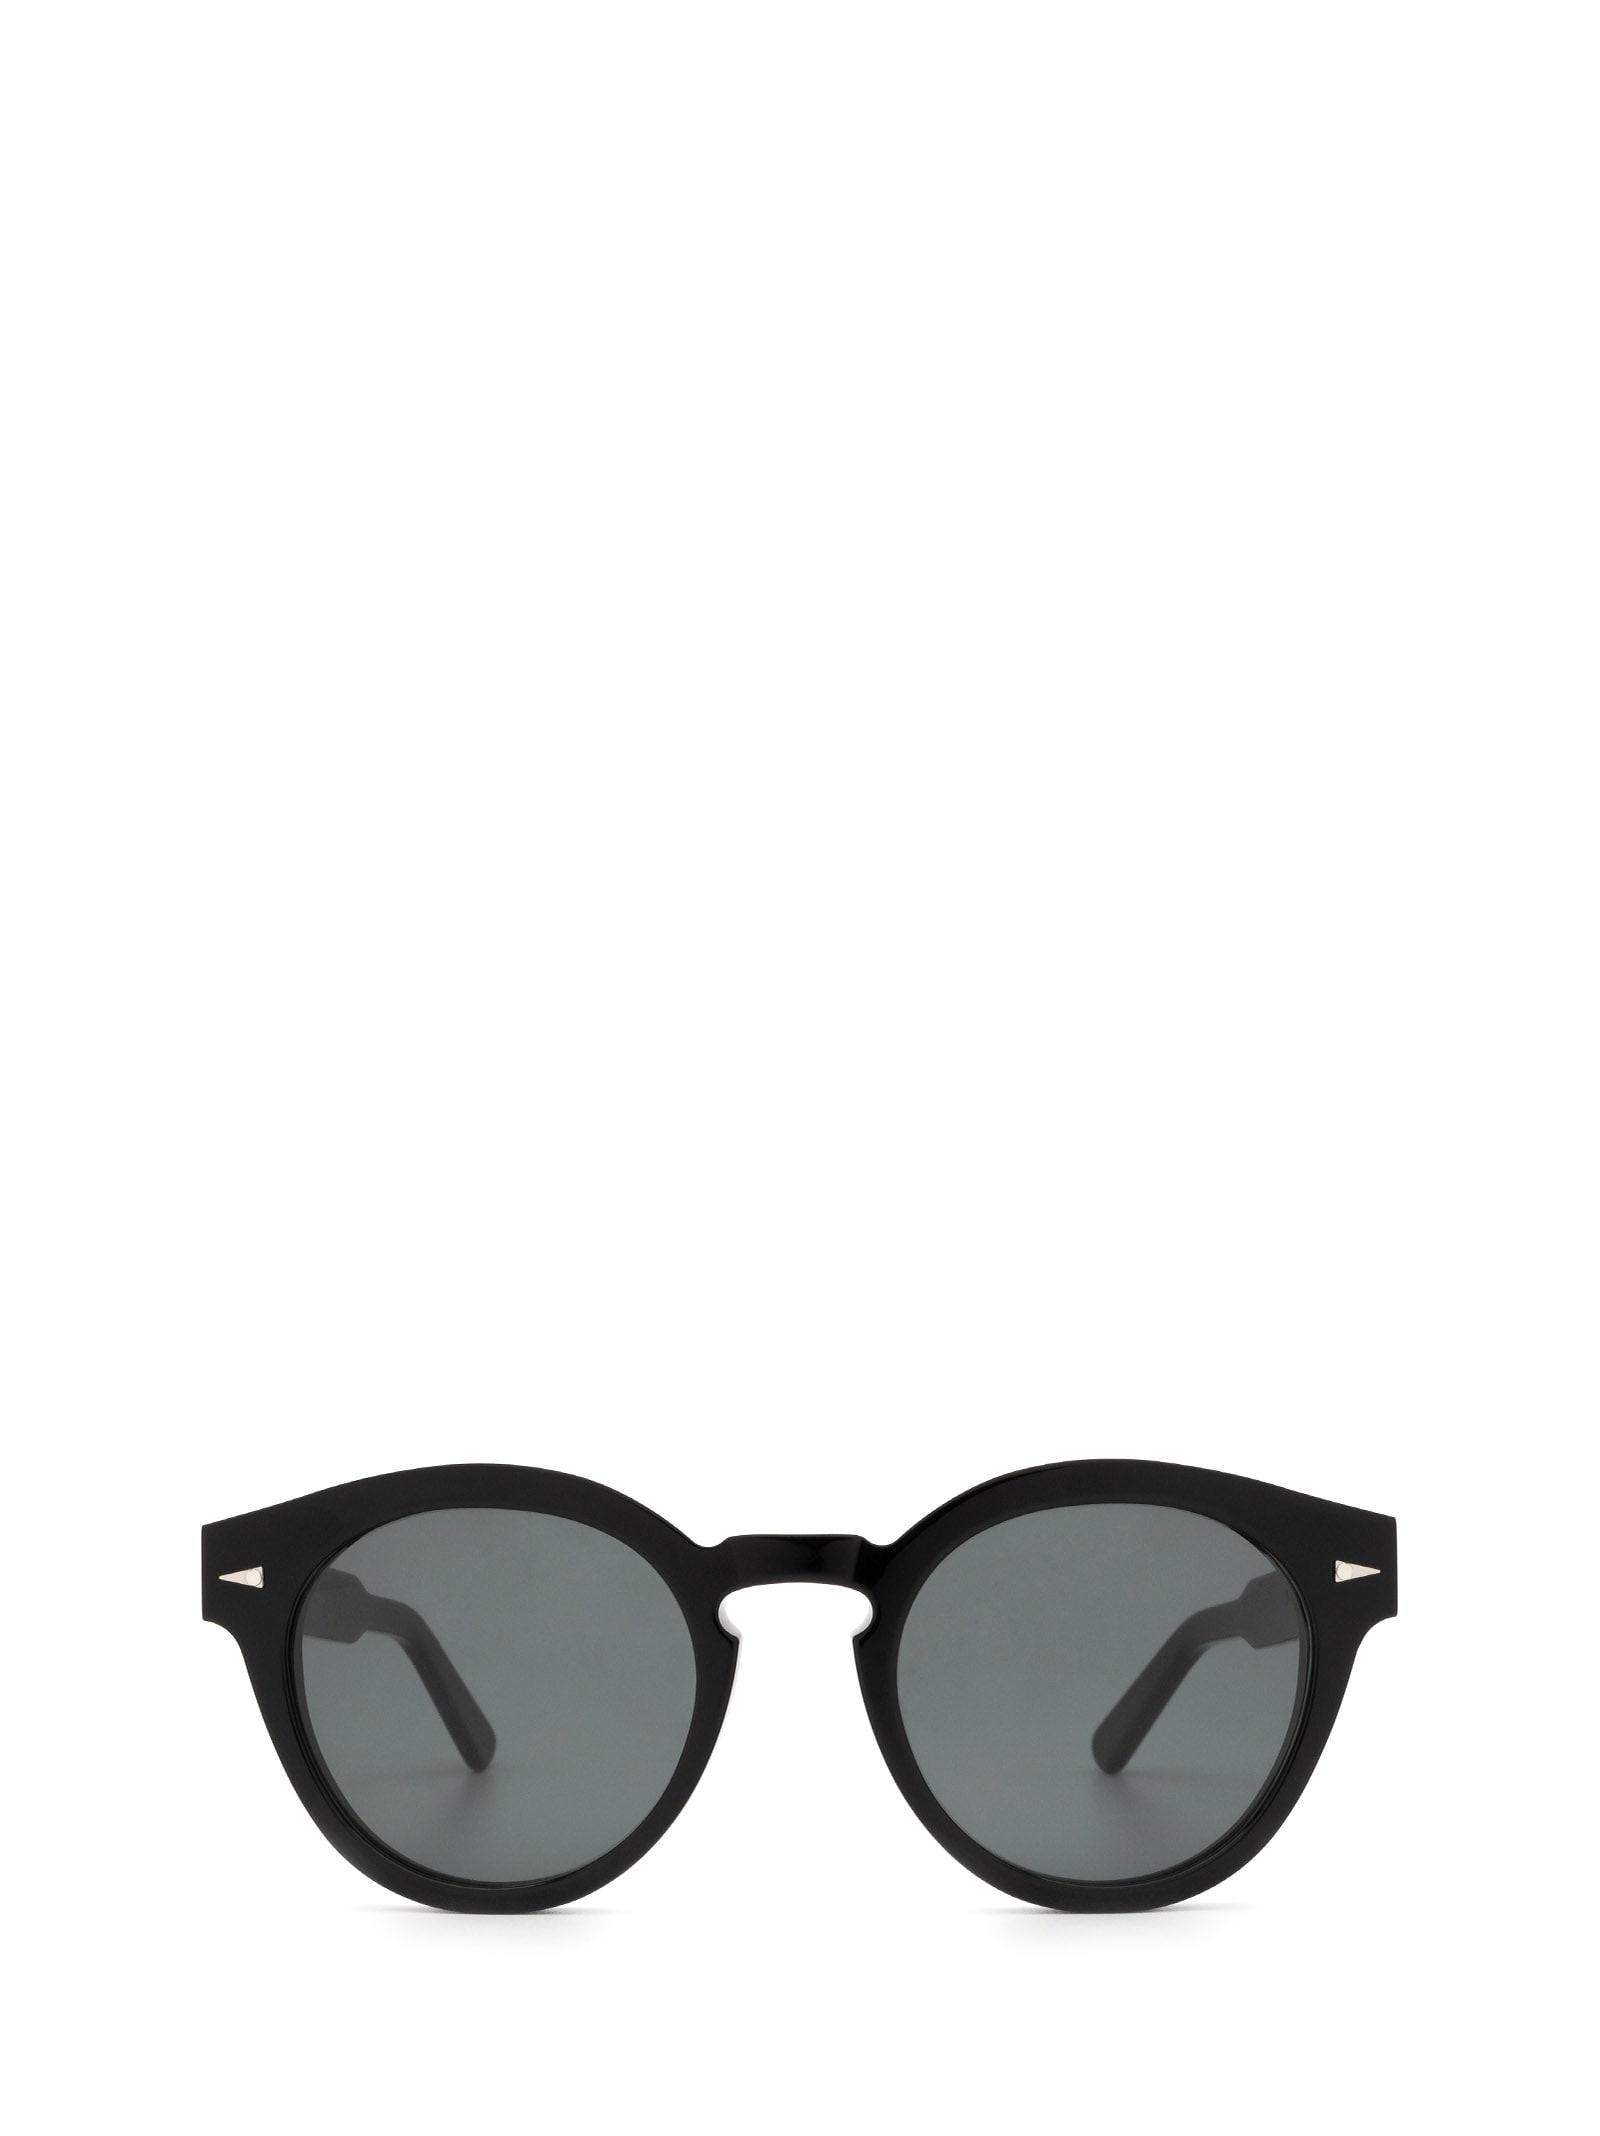 AHLEM Ahlem Abbesses Black Sunglasses